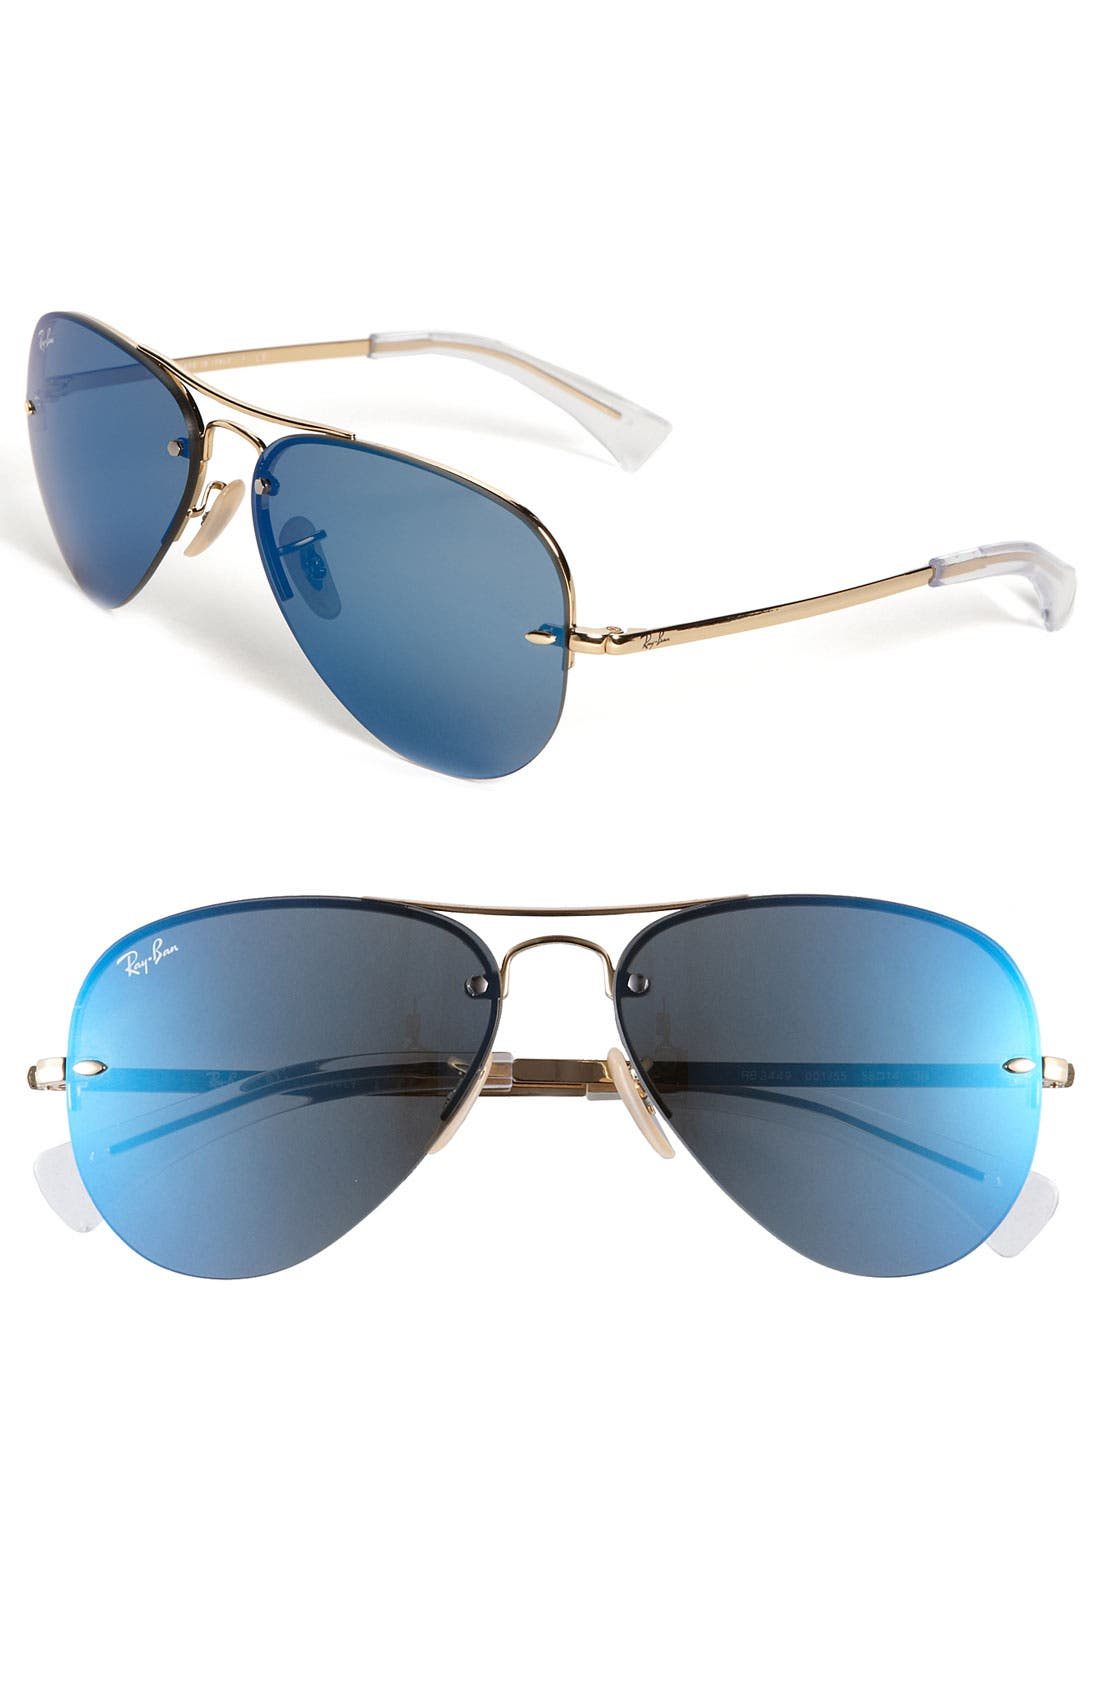 Main Image - Ray-Ban 56mm Semi Rimless Lightweight Aviator Sunglasses